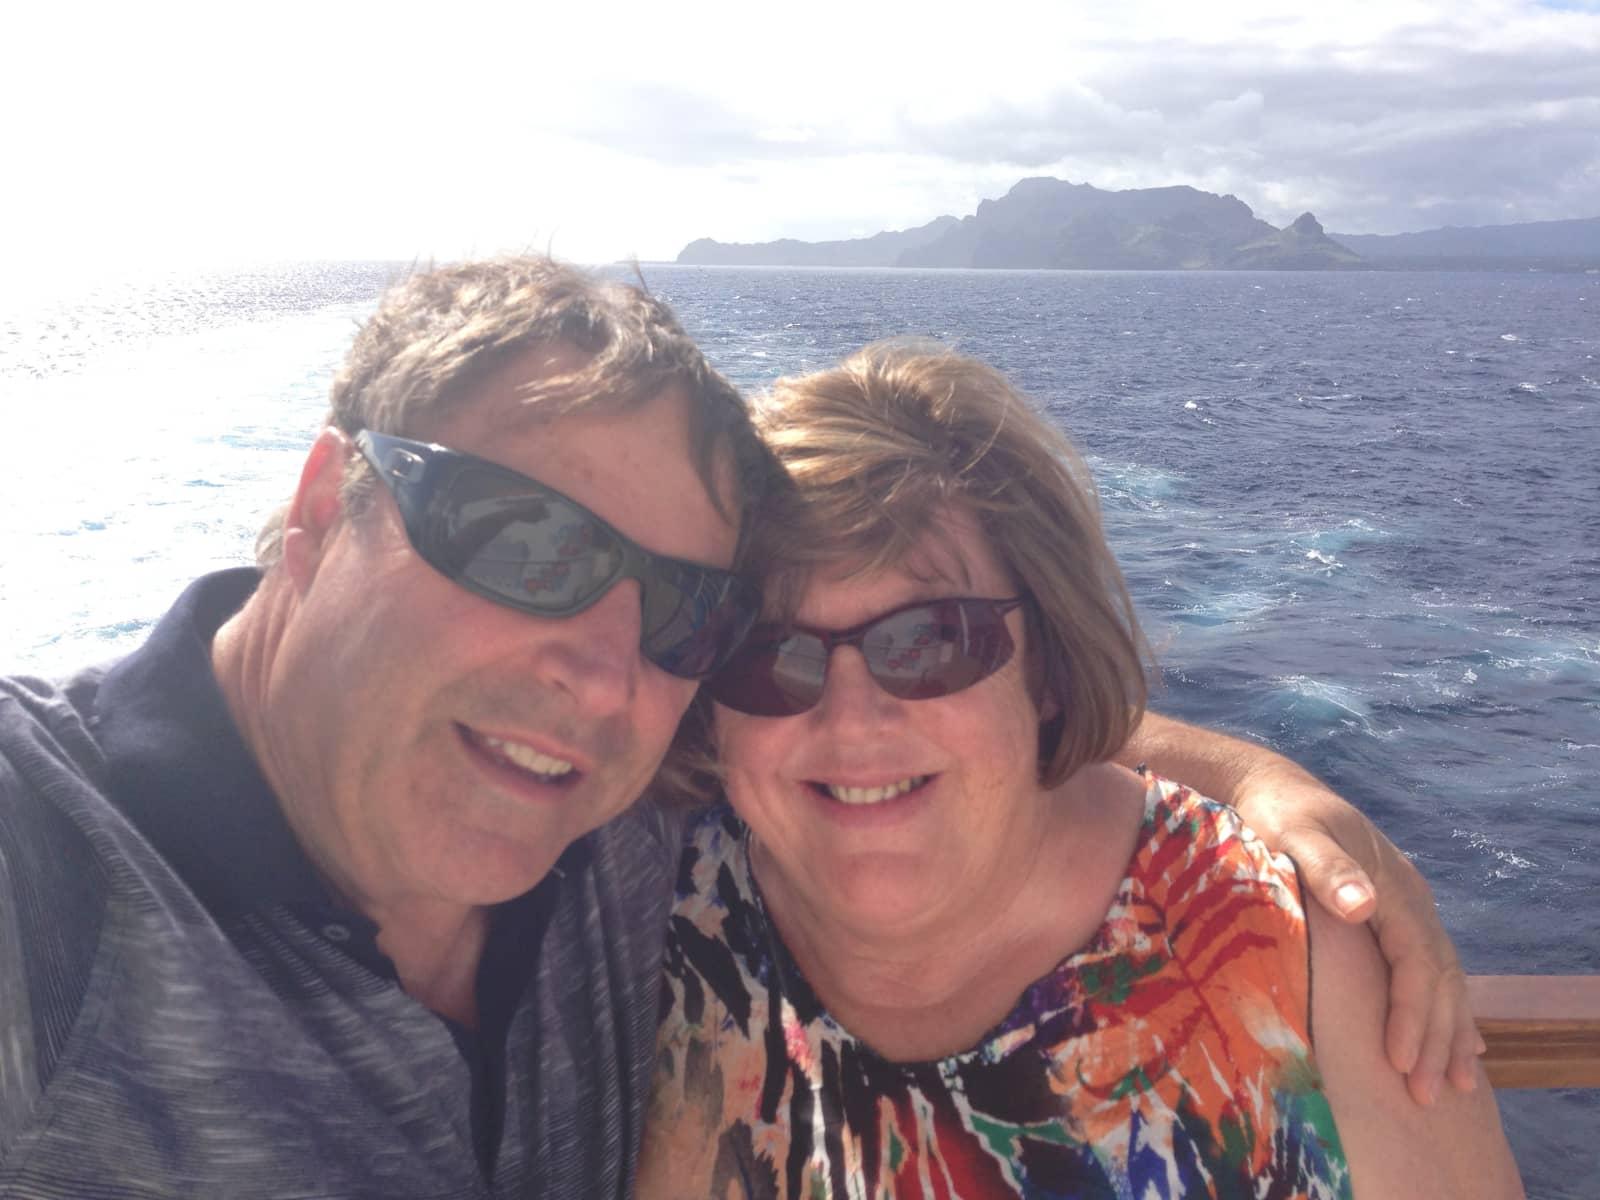 Neil & anne & Anne from Lower Hutt, New Zealand